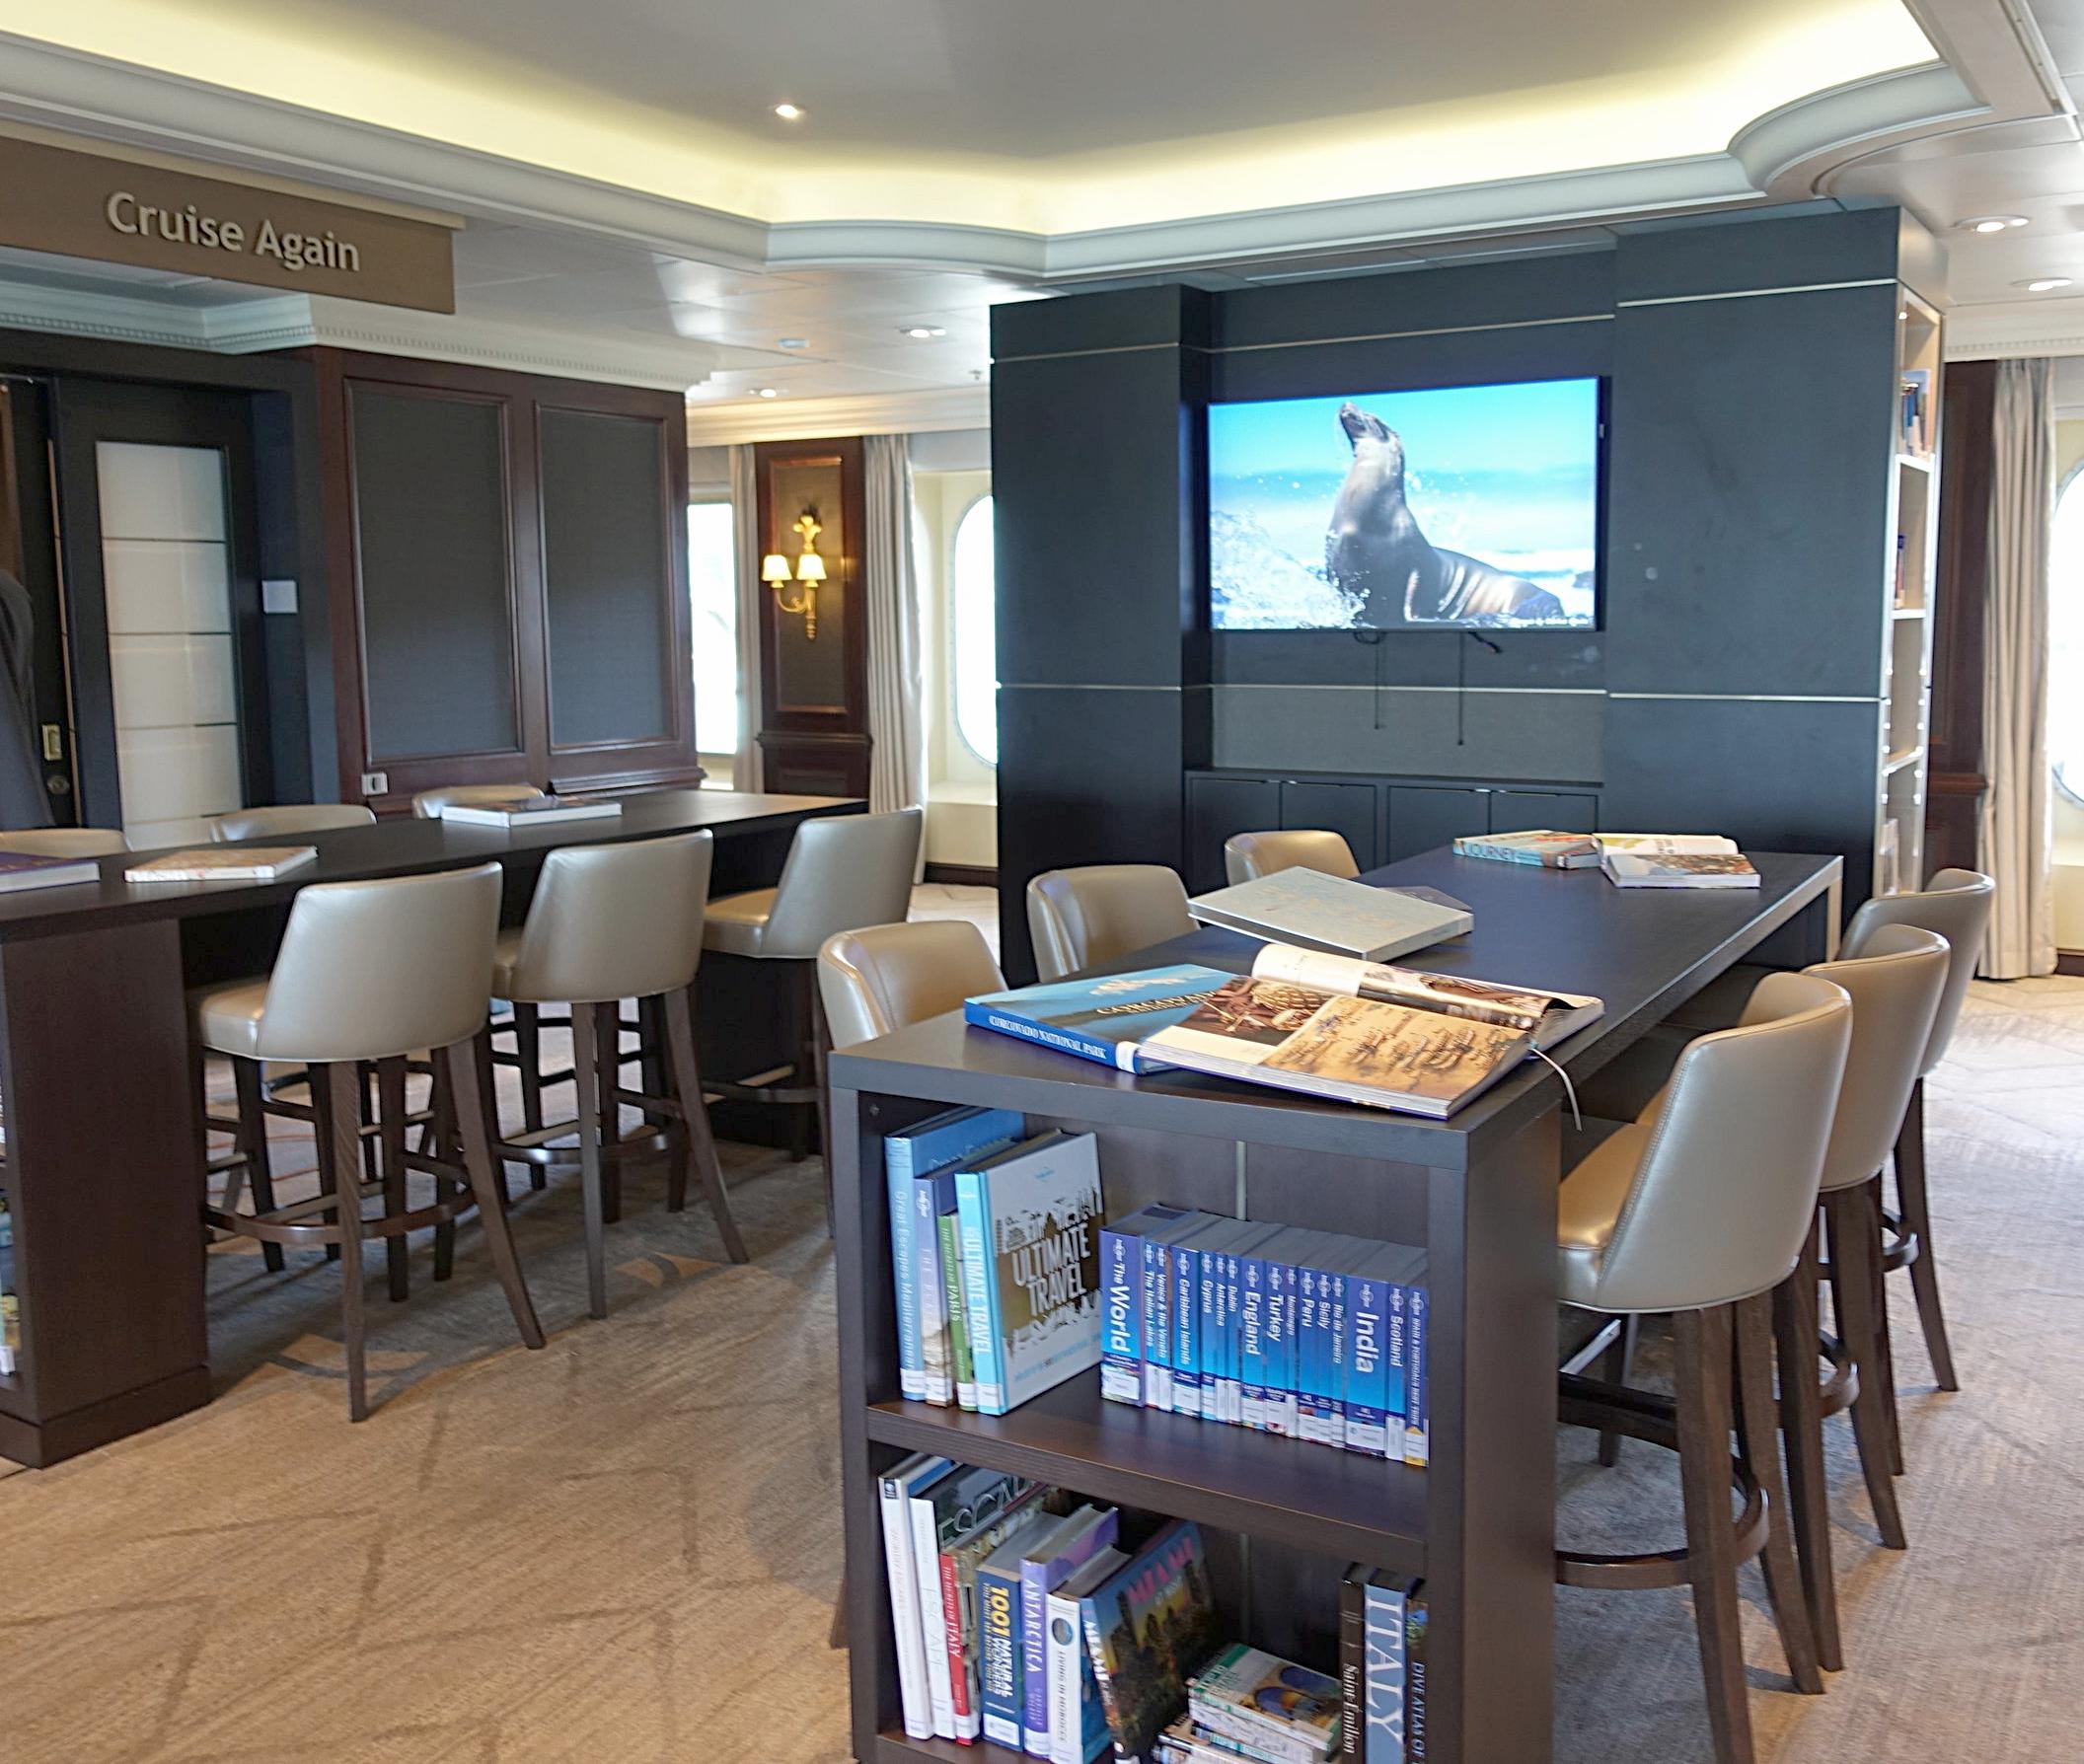 Shore excursions and Future Cruises desks.